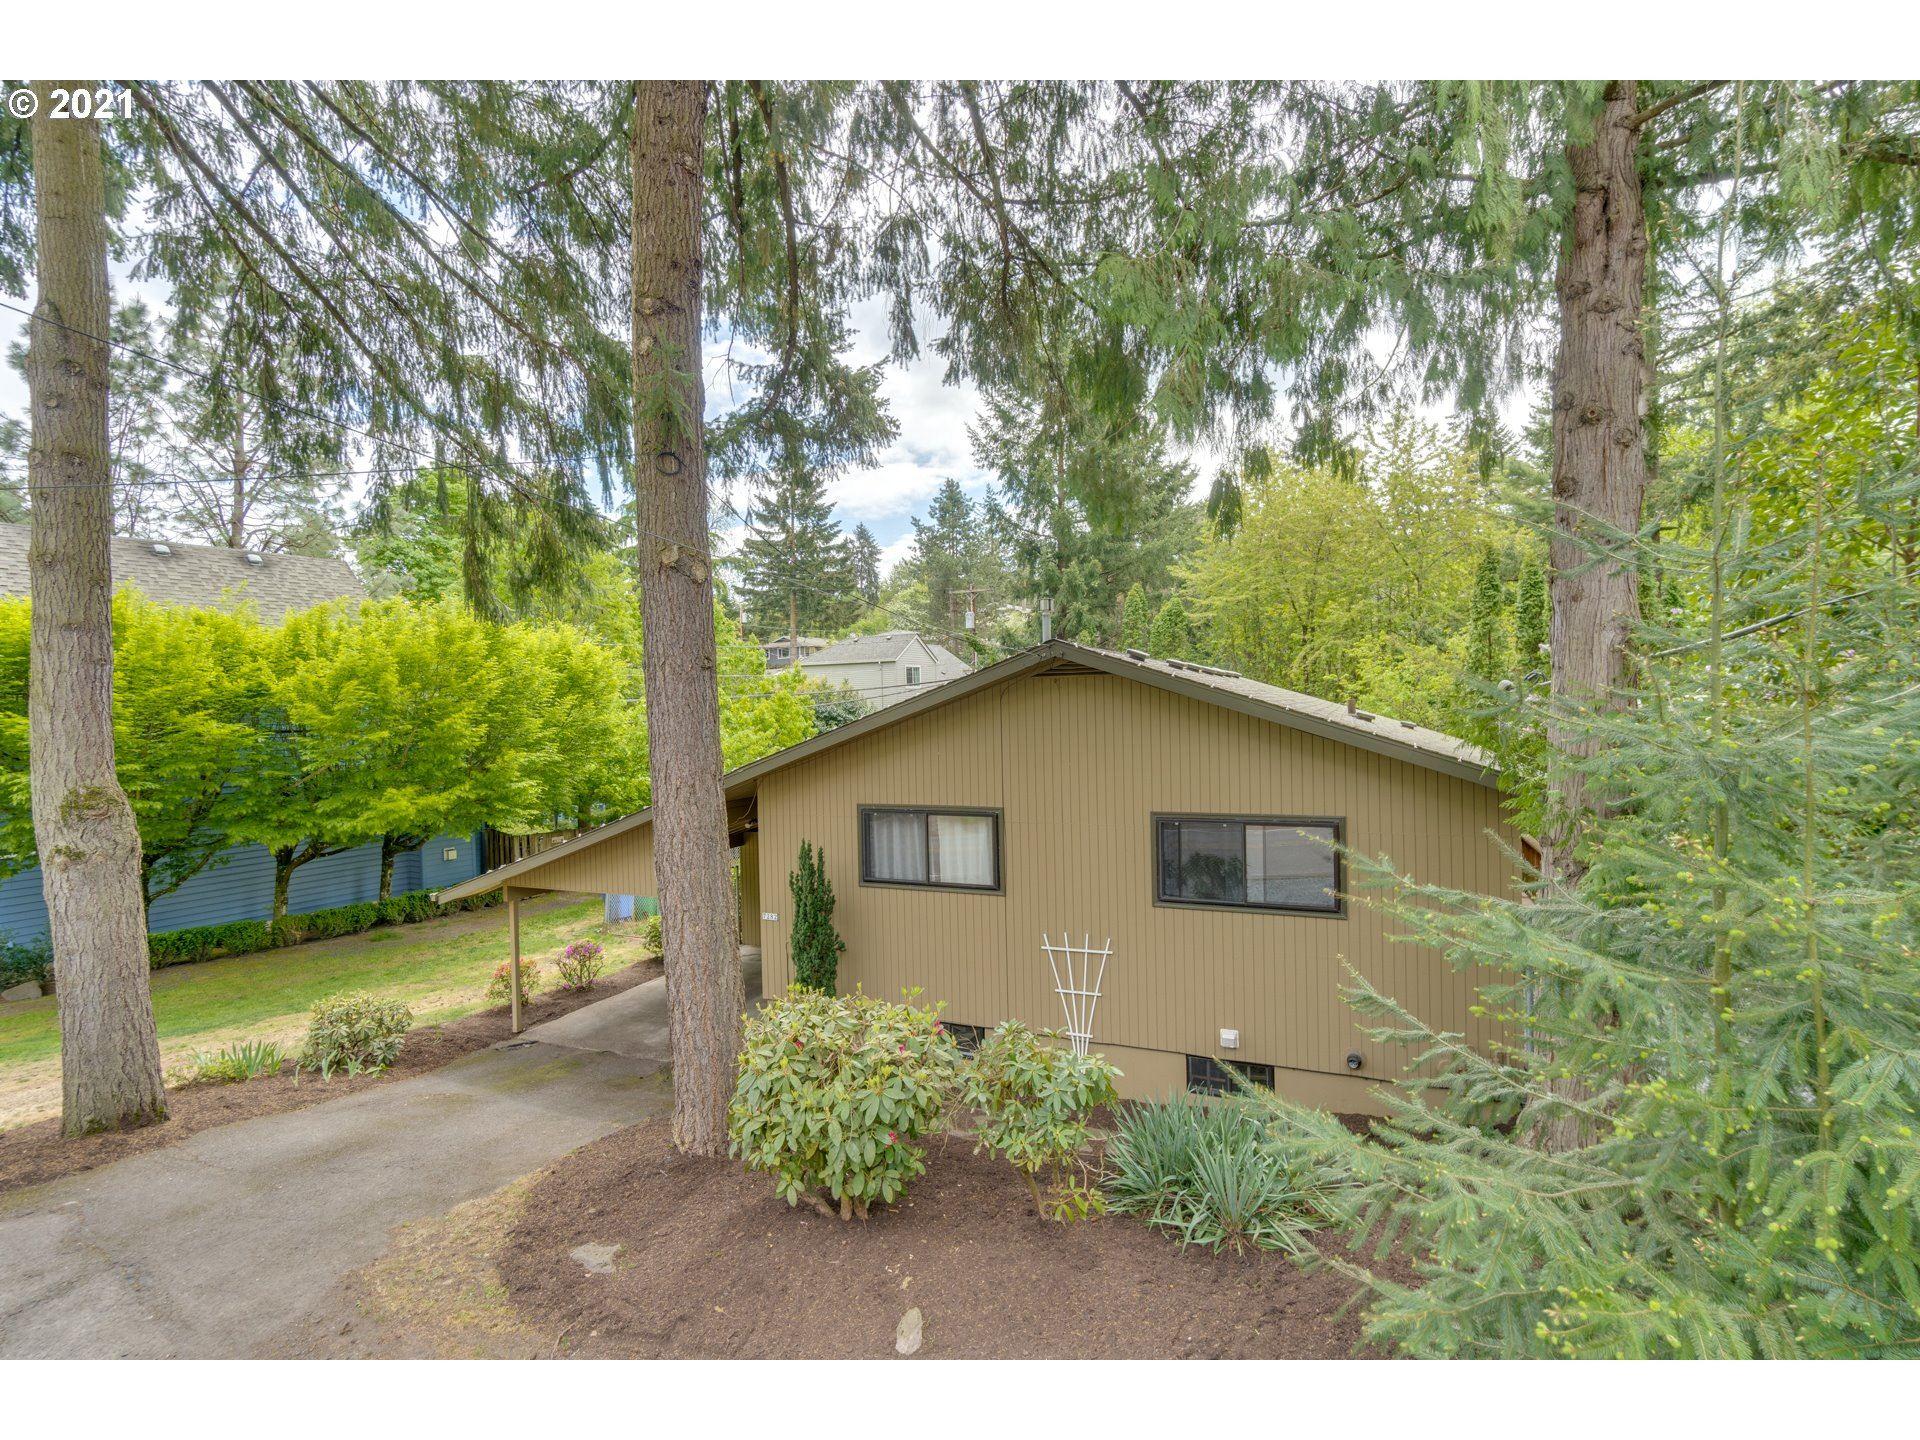 7282 SW CAPITOL HILL RD, Portland, OR 97219 - MLS#: 21144546